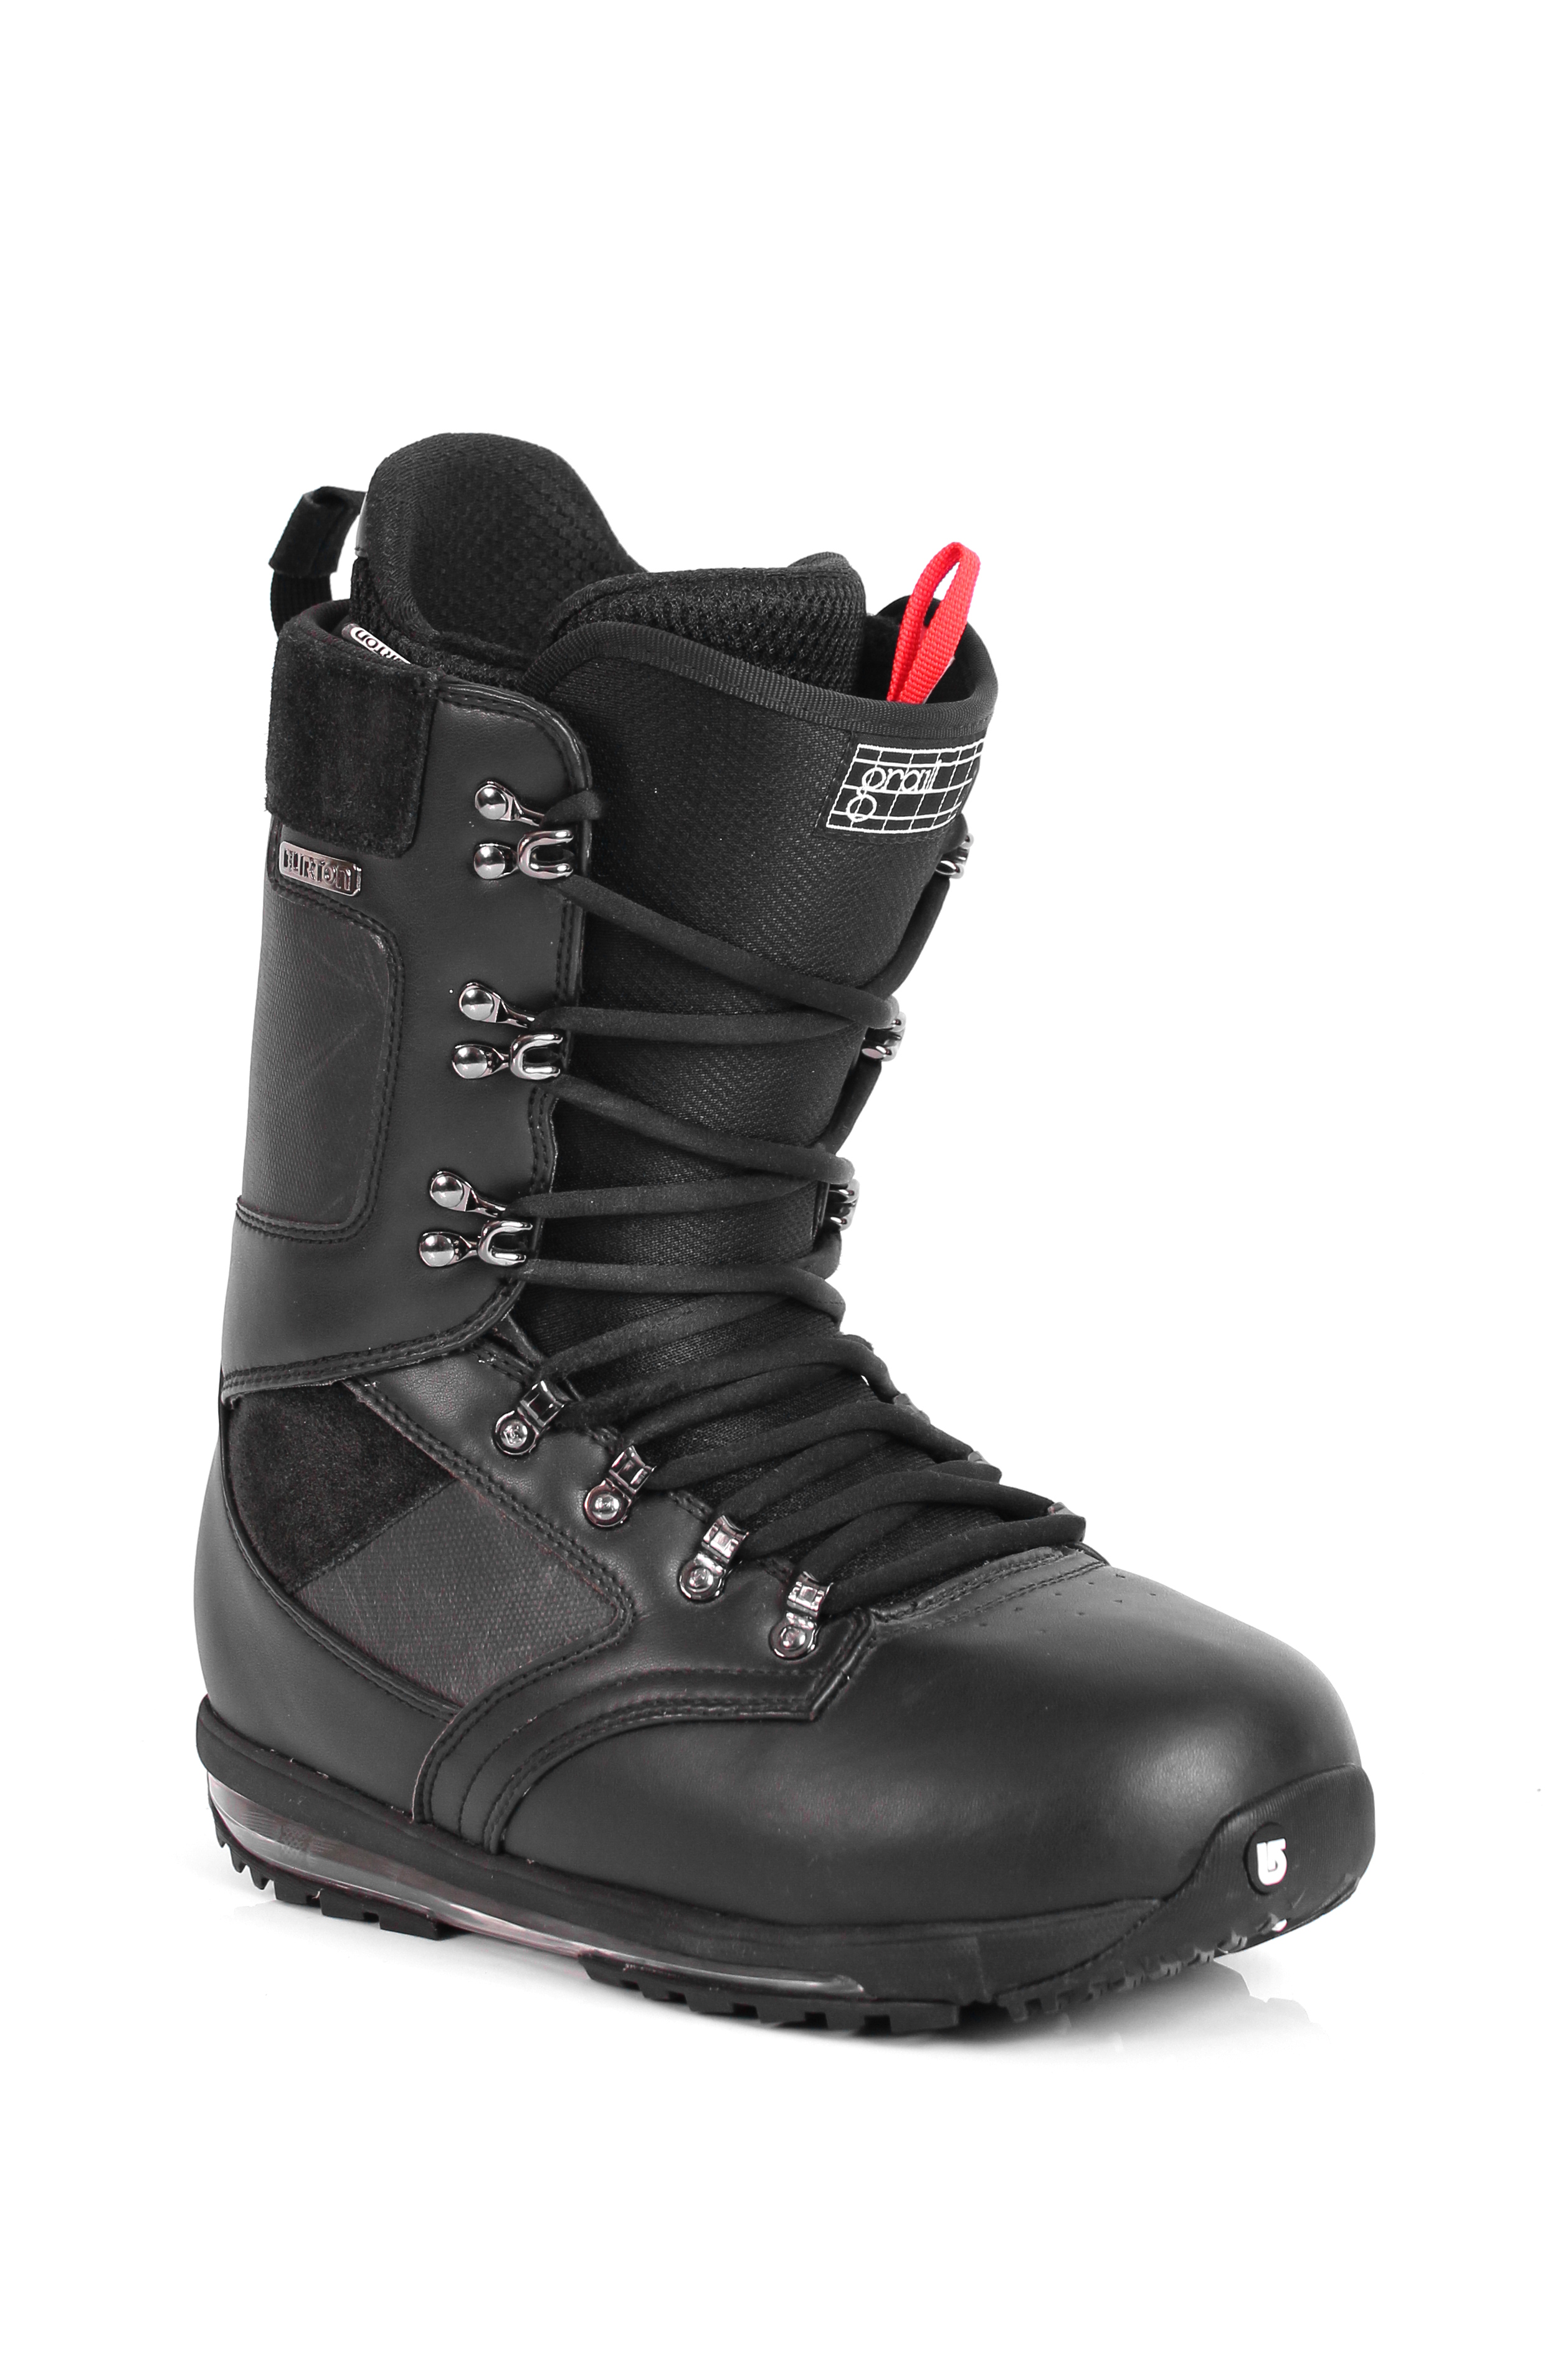 Buty Snowboardowe Burton Grail (Black Black)